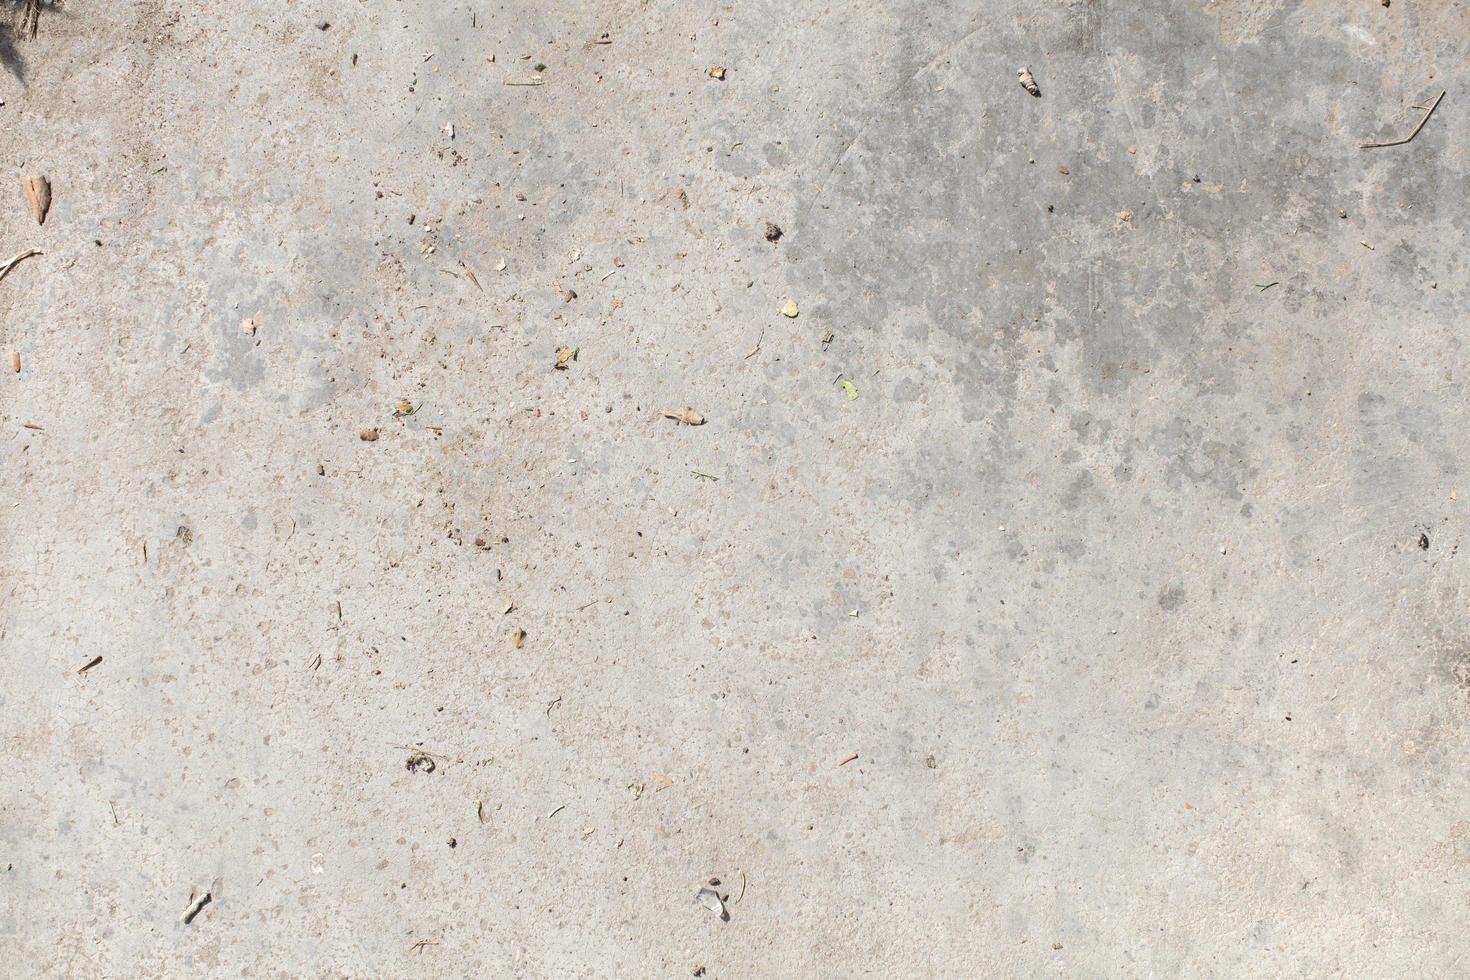 fondo de superficie texturizada foto